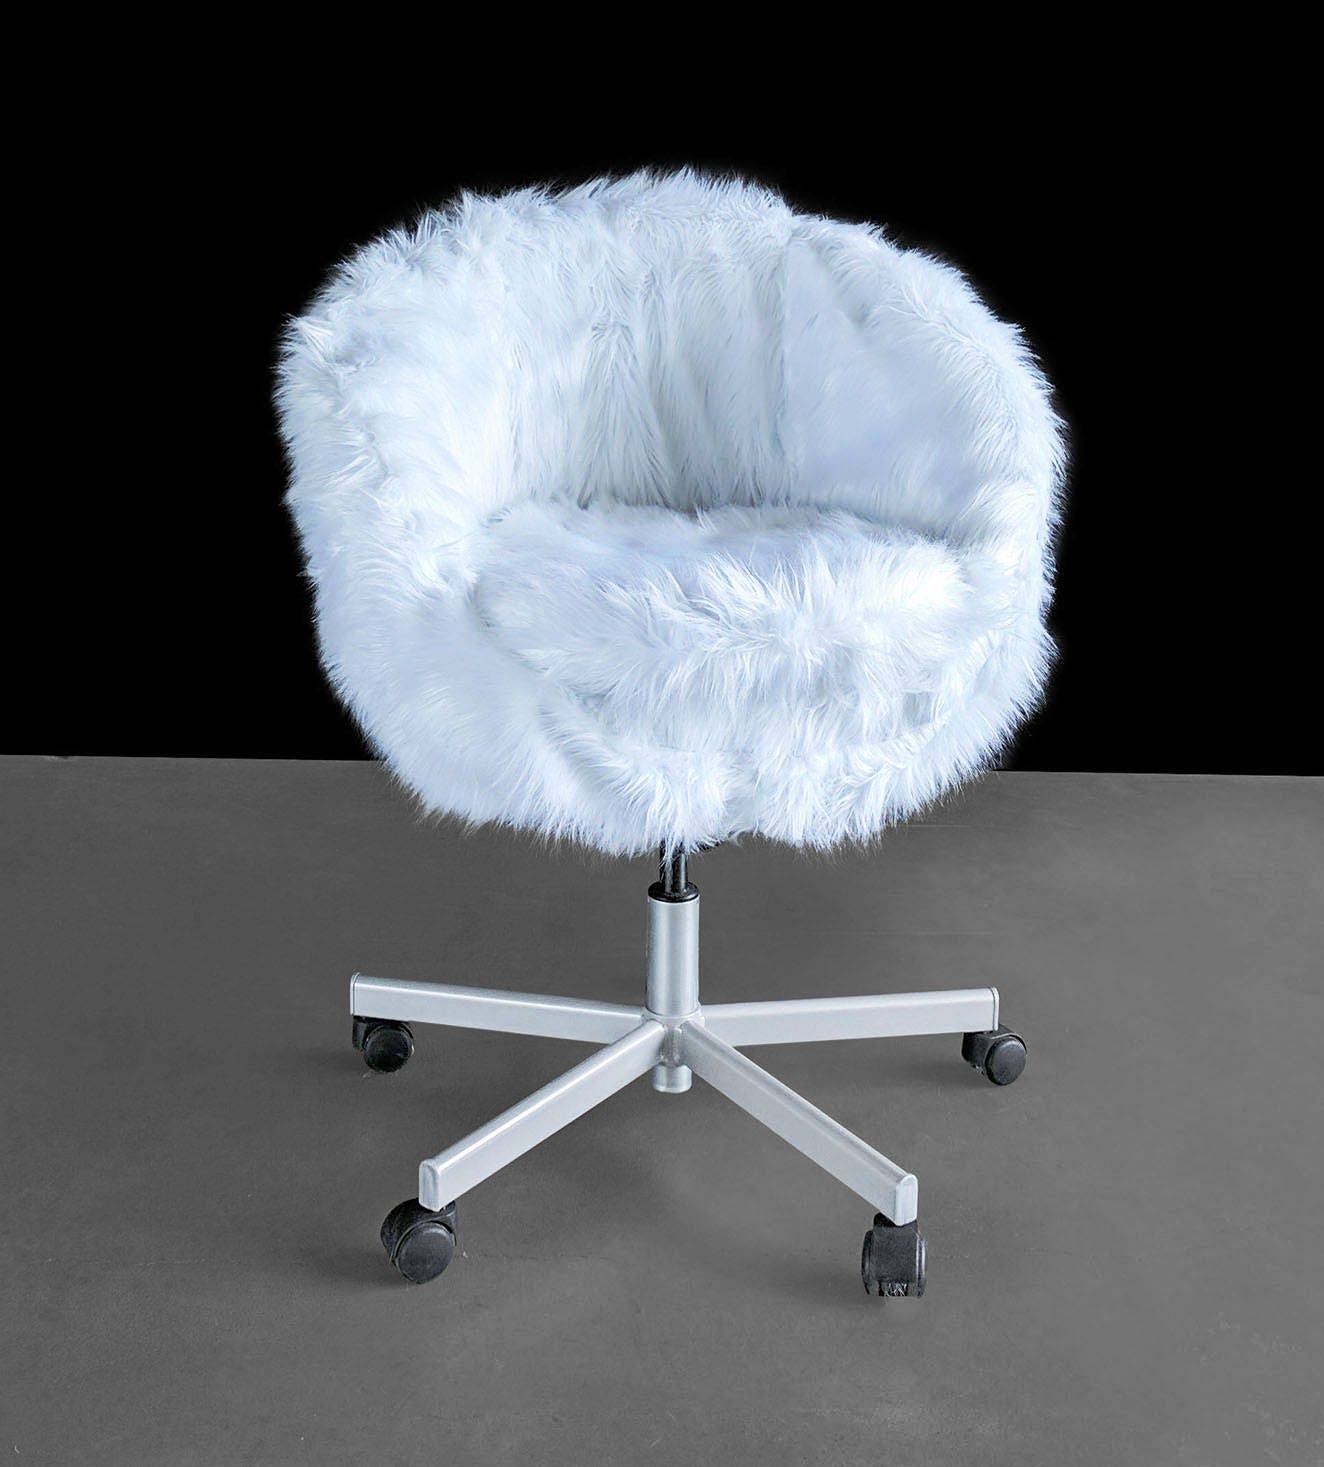 ikea wei es fell skruvsta stuhl beleg abdeckung. Black Bedroom Furniture Sets. Home Design Ideas